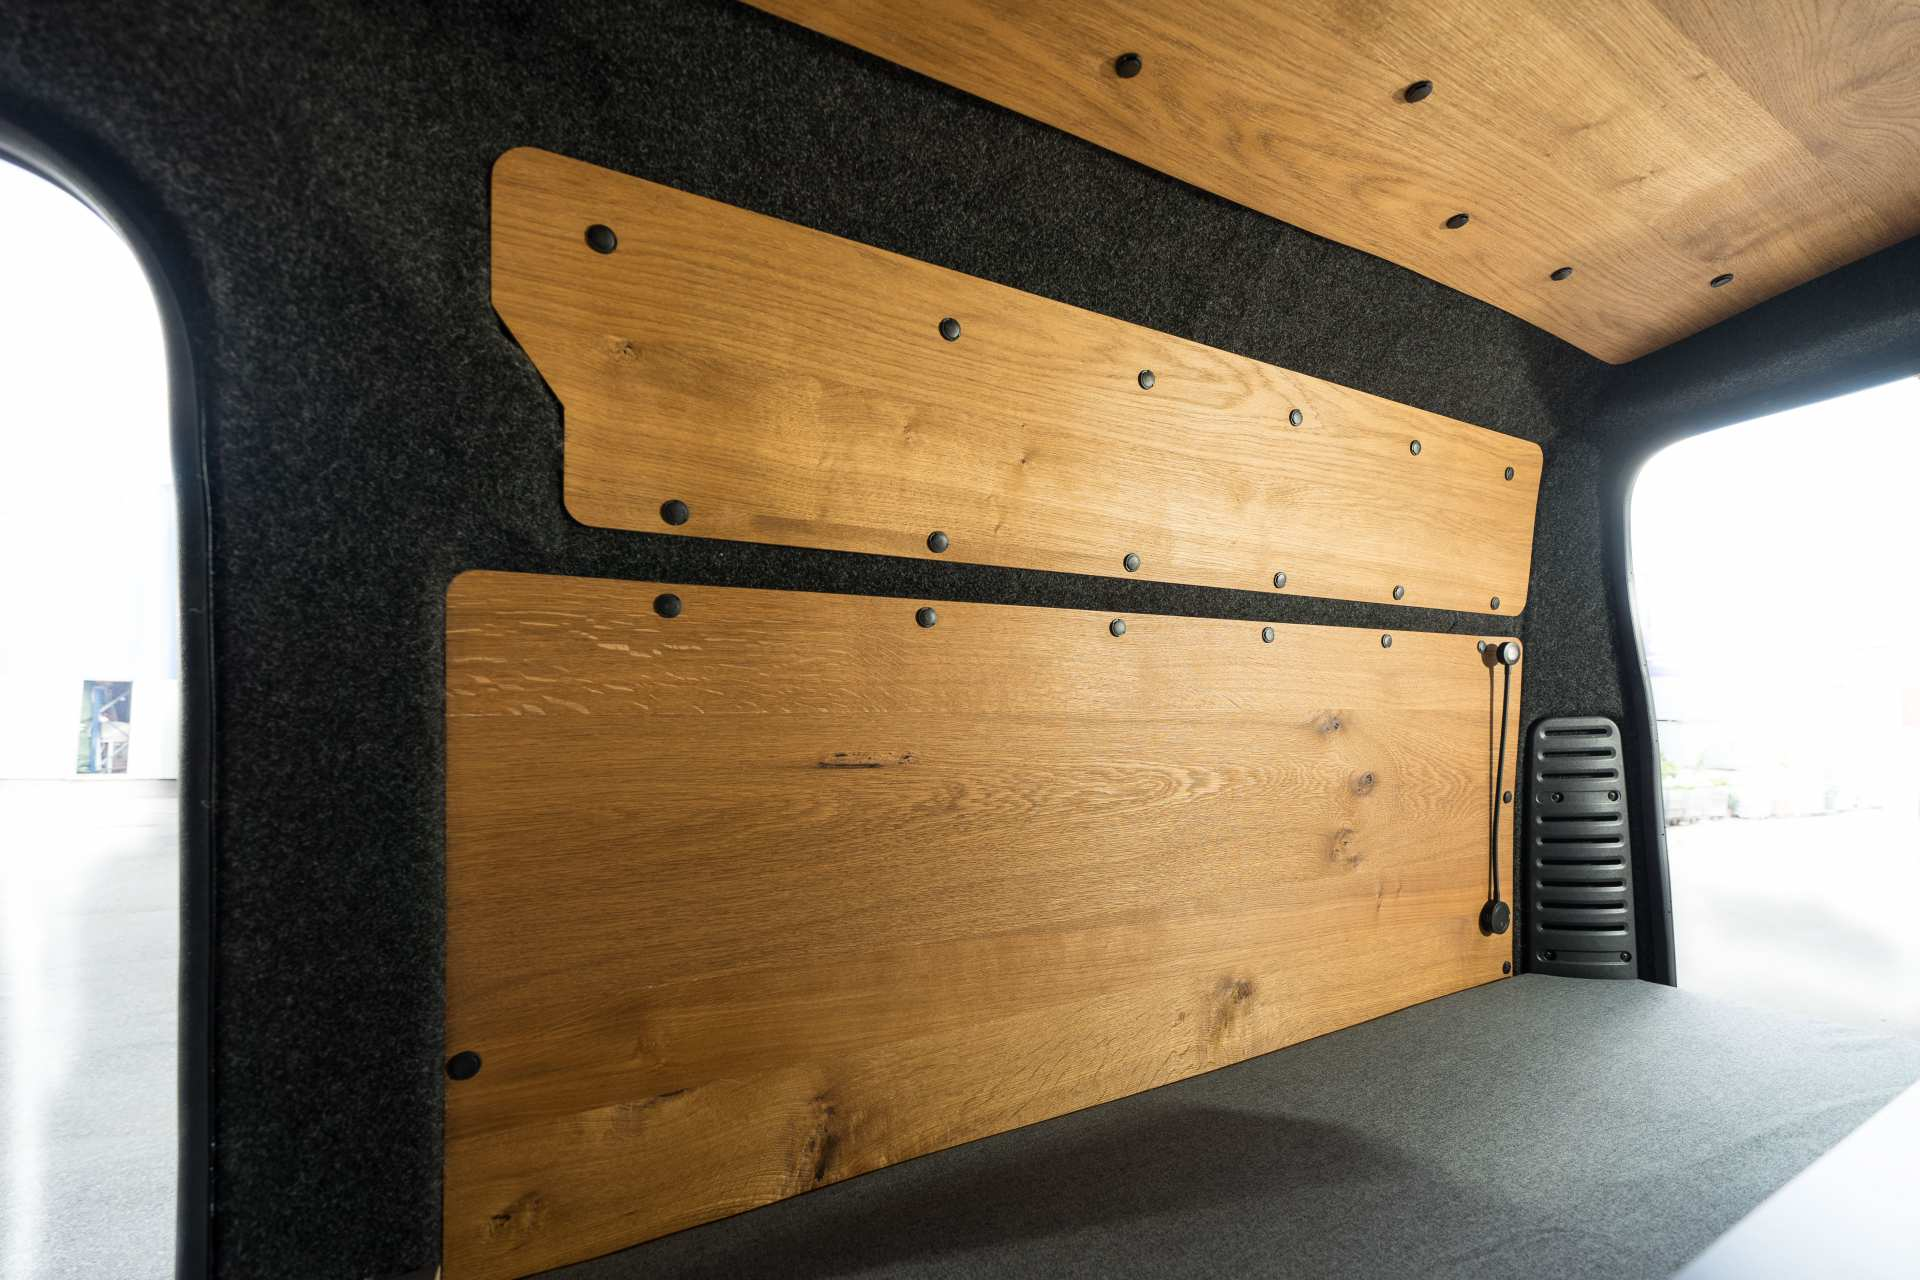 Individualausbau: Zwei-Raumwohnung Peugeot Boxer L2 H2 - 17